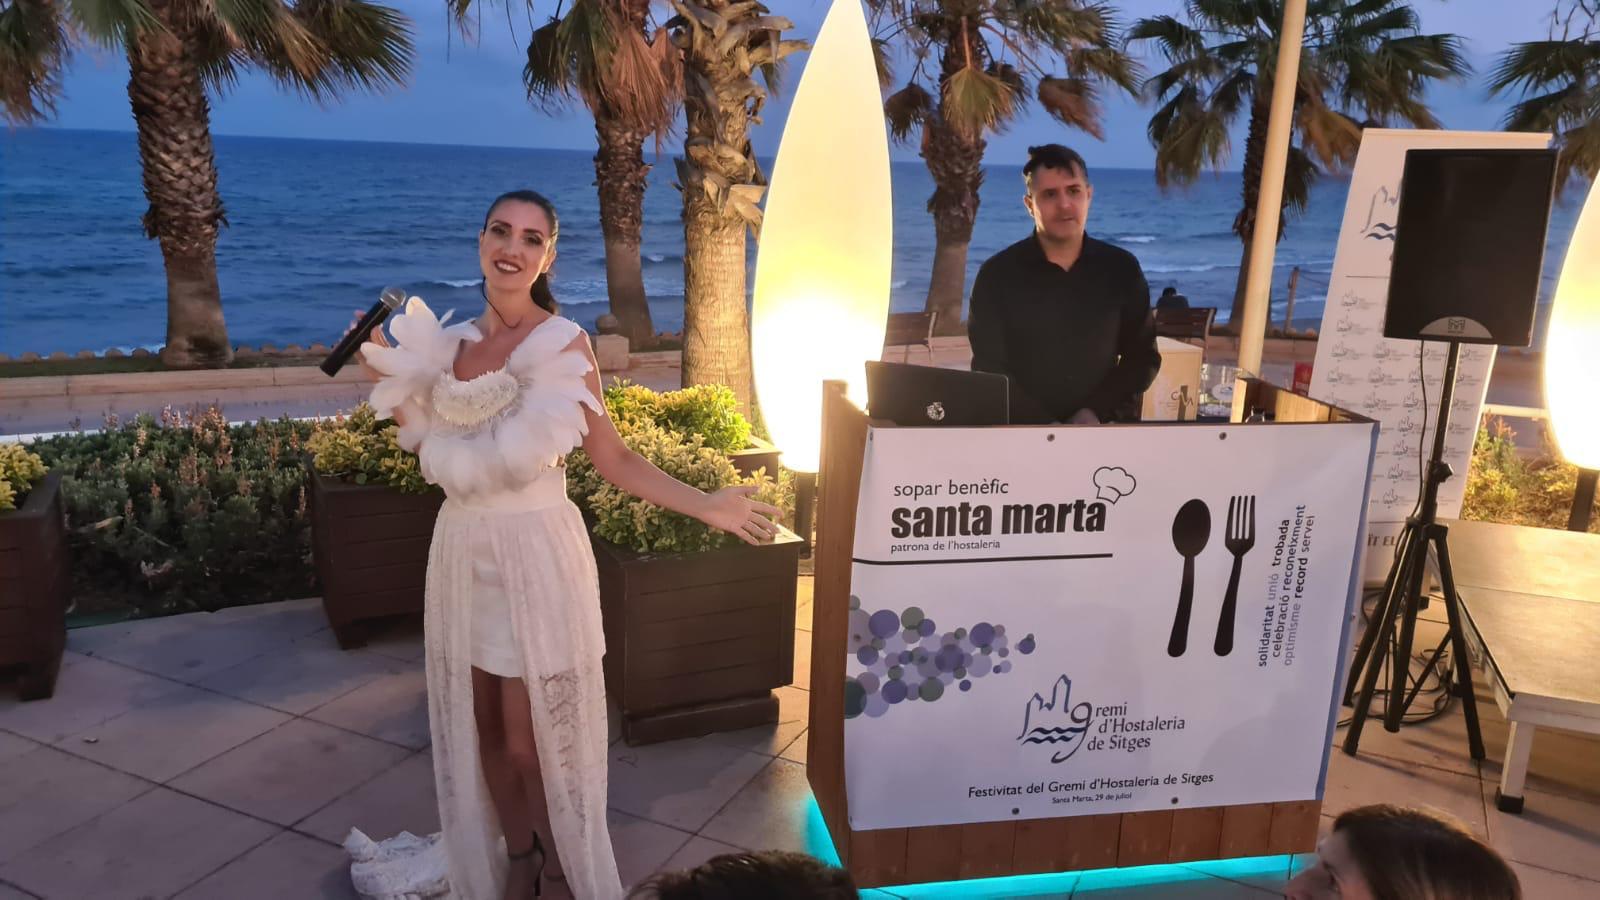 Sopar Benpefic Santa Marta Sitges 2021